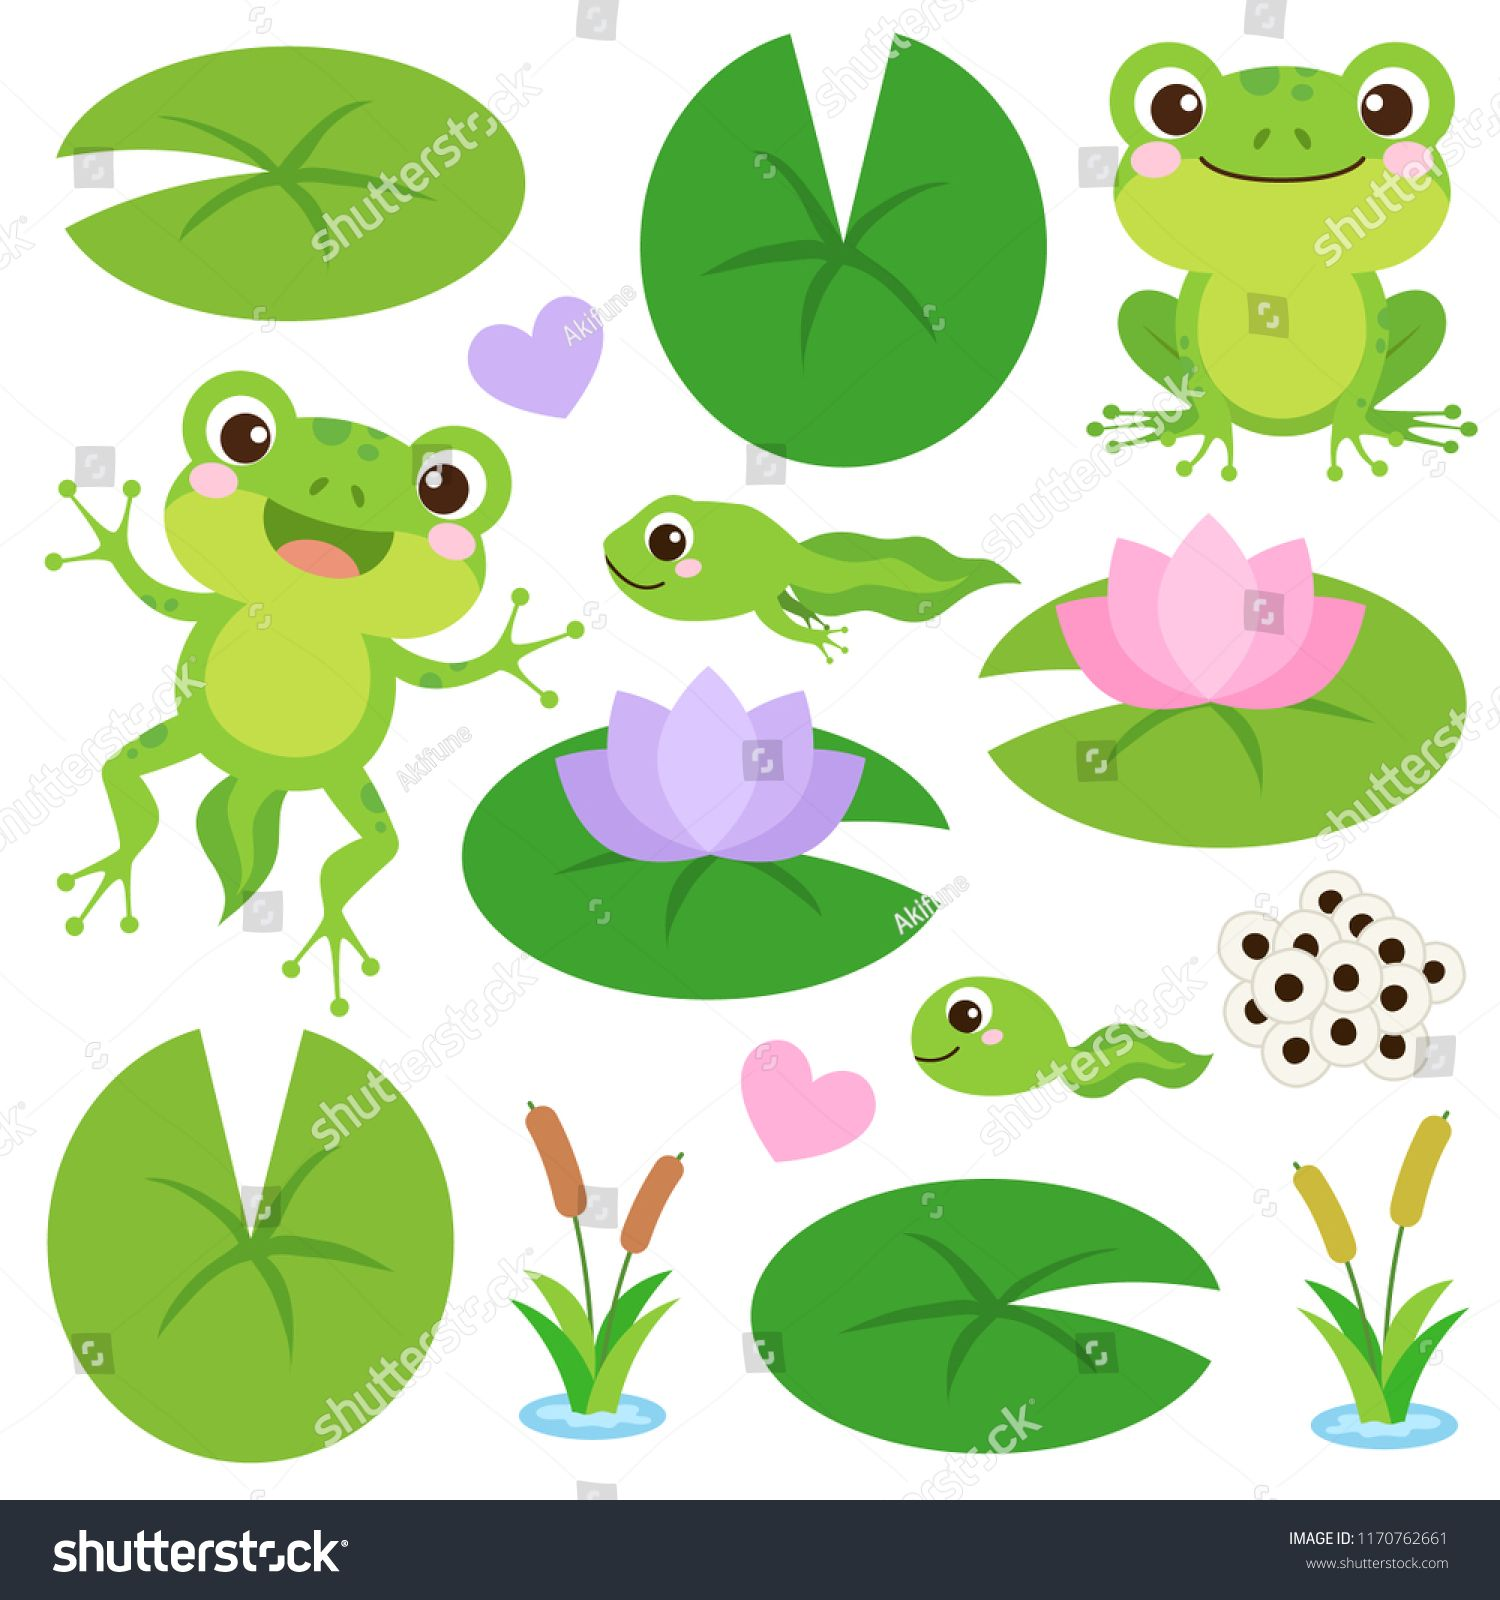 Set of Cute Frogs. Egg masses, tadpole, froglet, frog, hearts.